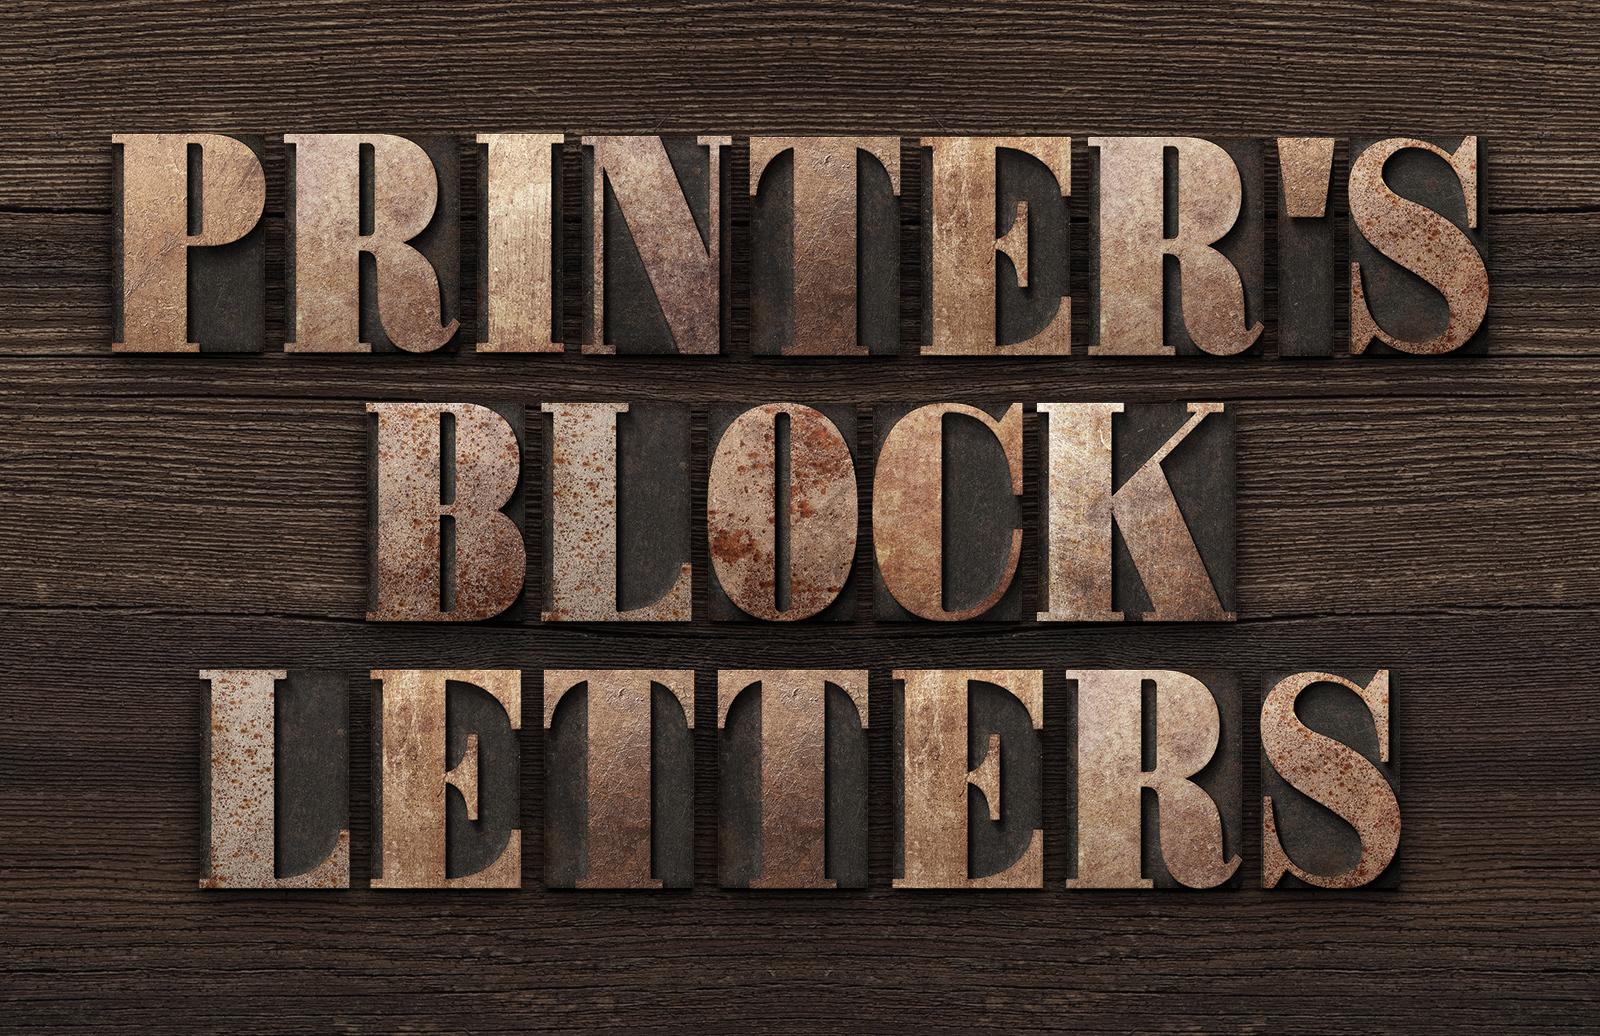 Large Printers Letterpress Block Letters Preview 1